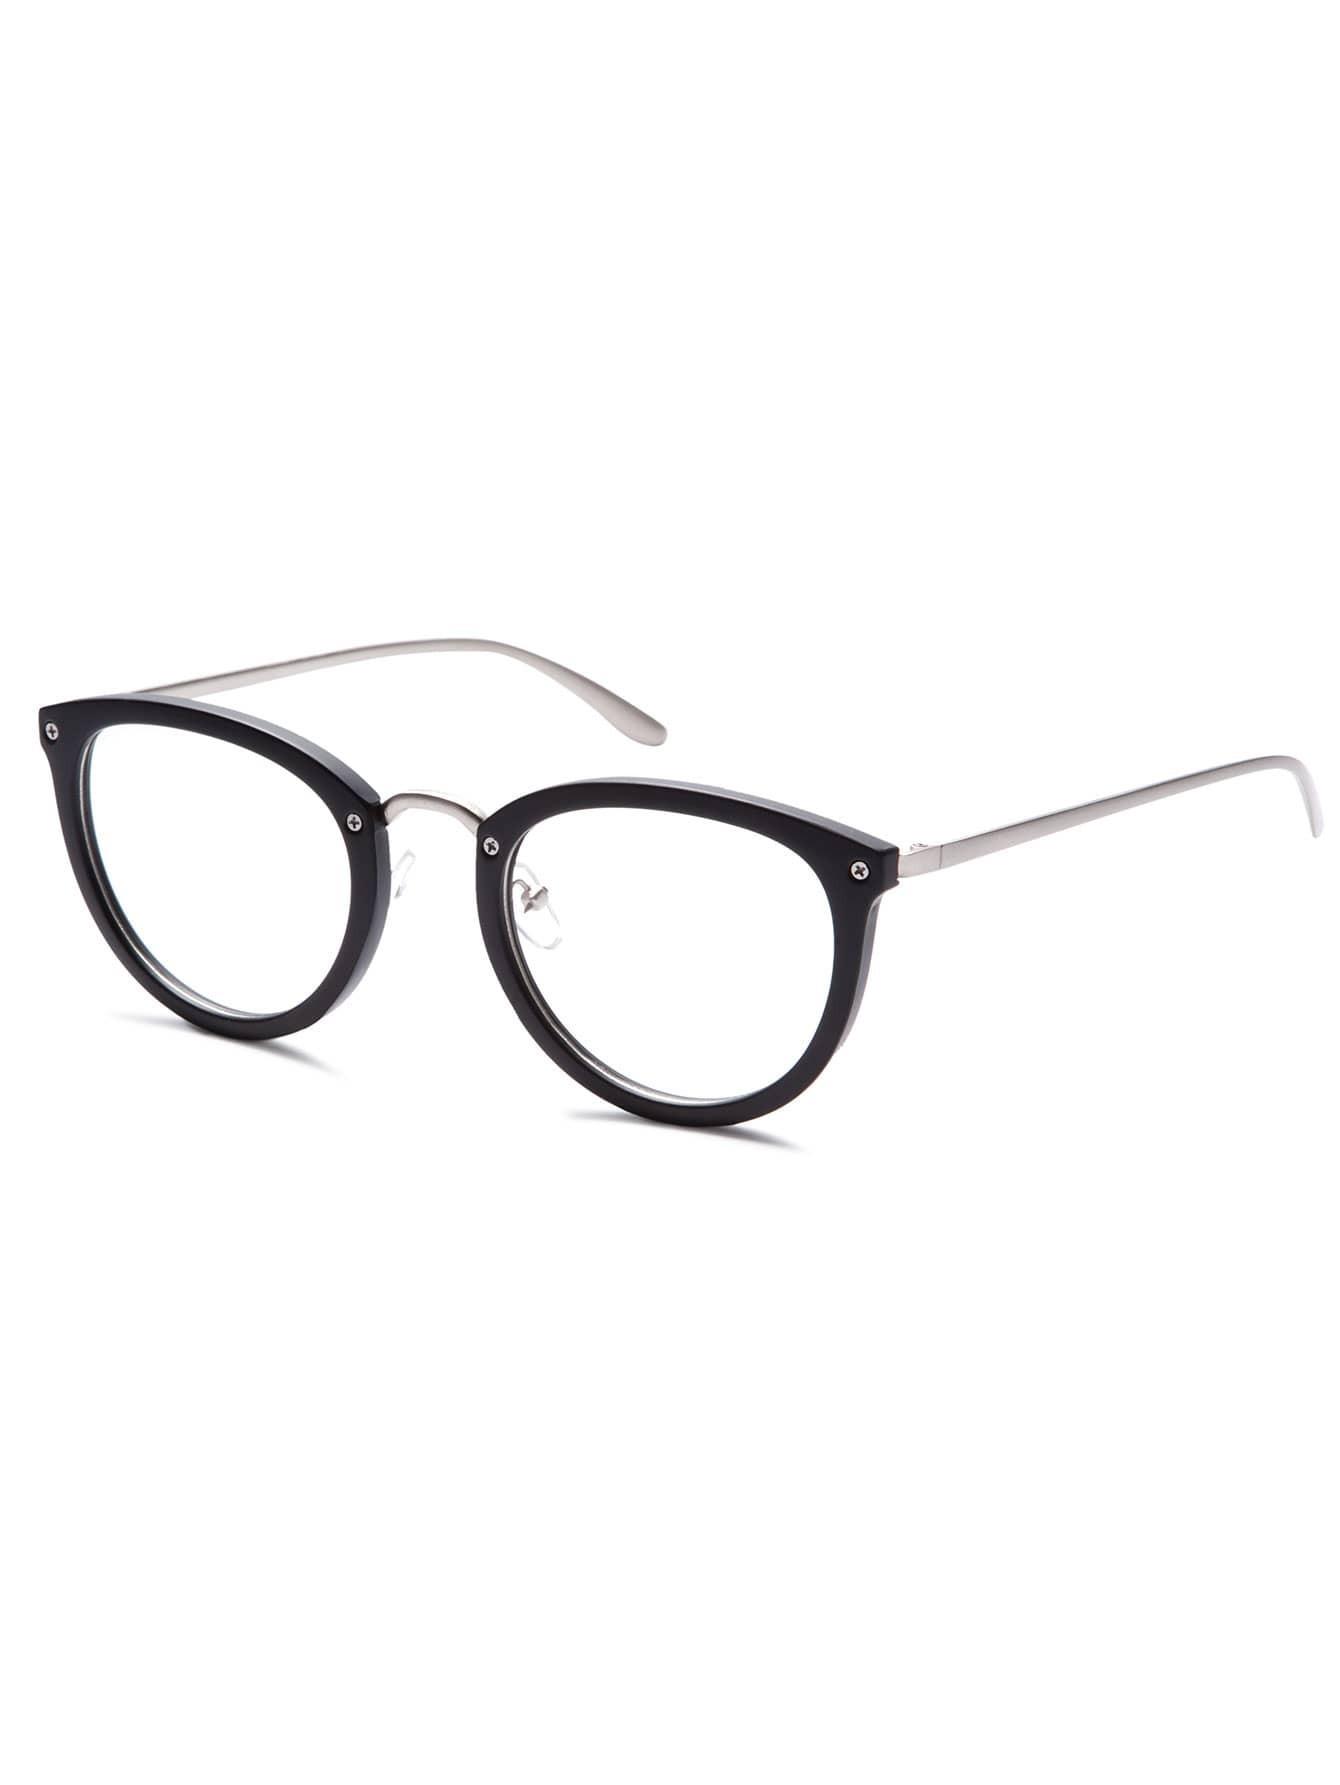 d11acf241f2 Matte Black Frame Silver Arm Glasses EmmaCloth-Women Fast Fashion Online